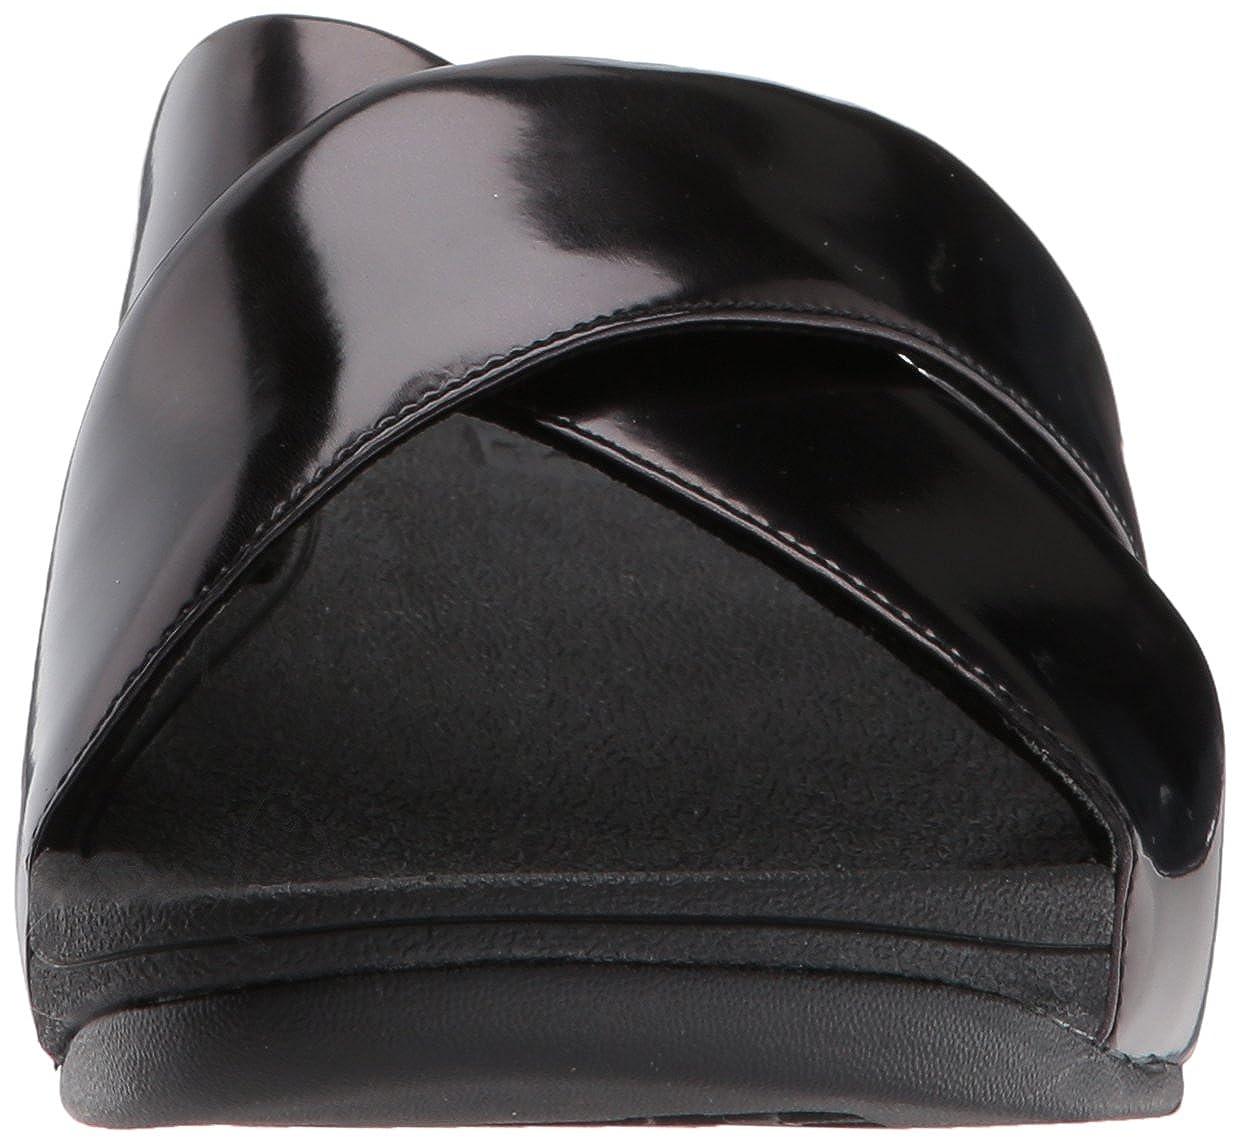 fitflop Women's B0757NLHZ7 Swoop Slide Sandals B0757NLHZ7 Women's Slides bf3cab